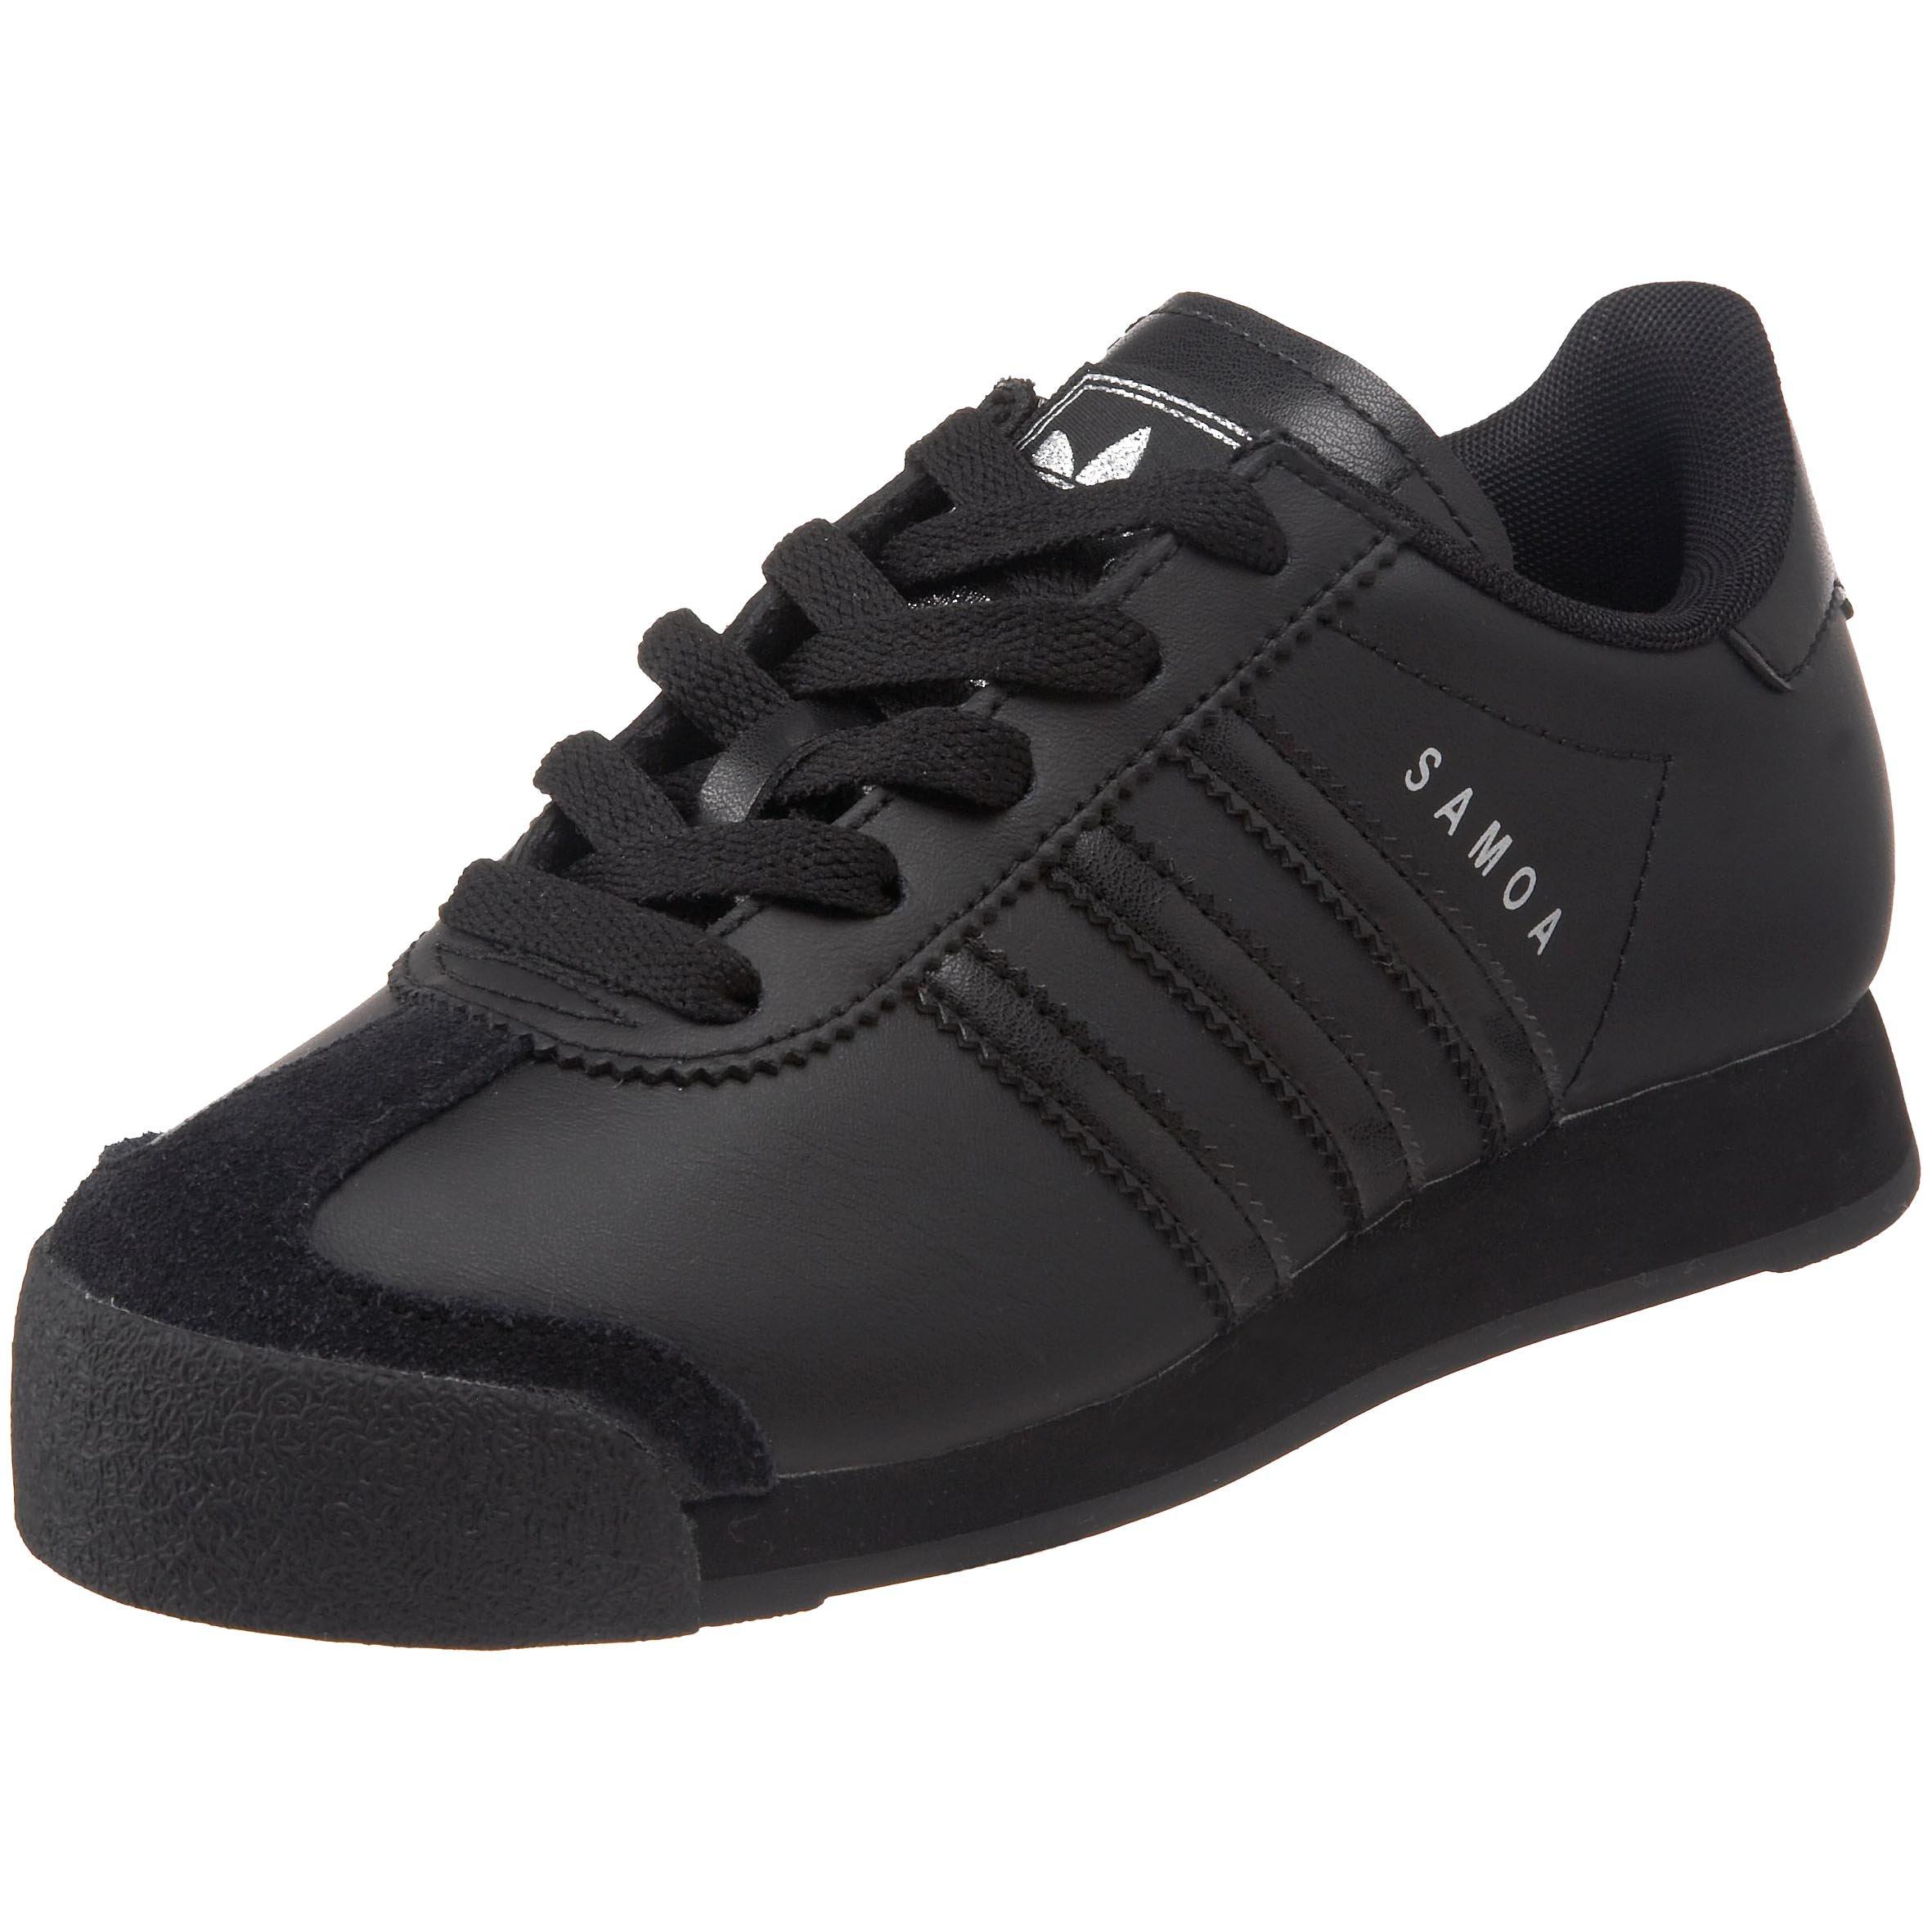 promo code 9bb85 8f752 Galleon - Adidas Originals Samoa Sneaker (Little Kid Big  Kid),Black Black Metallic Silver,5 M US Big Kid